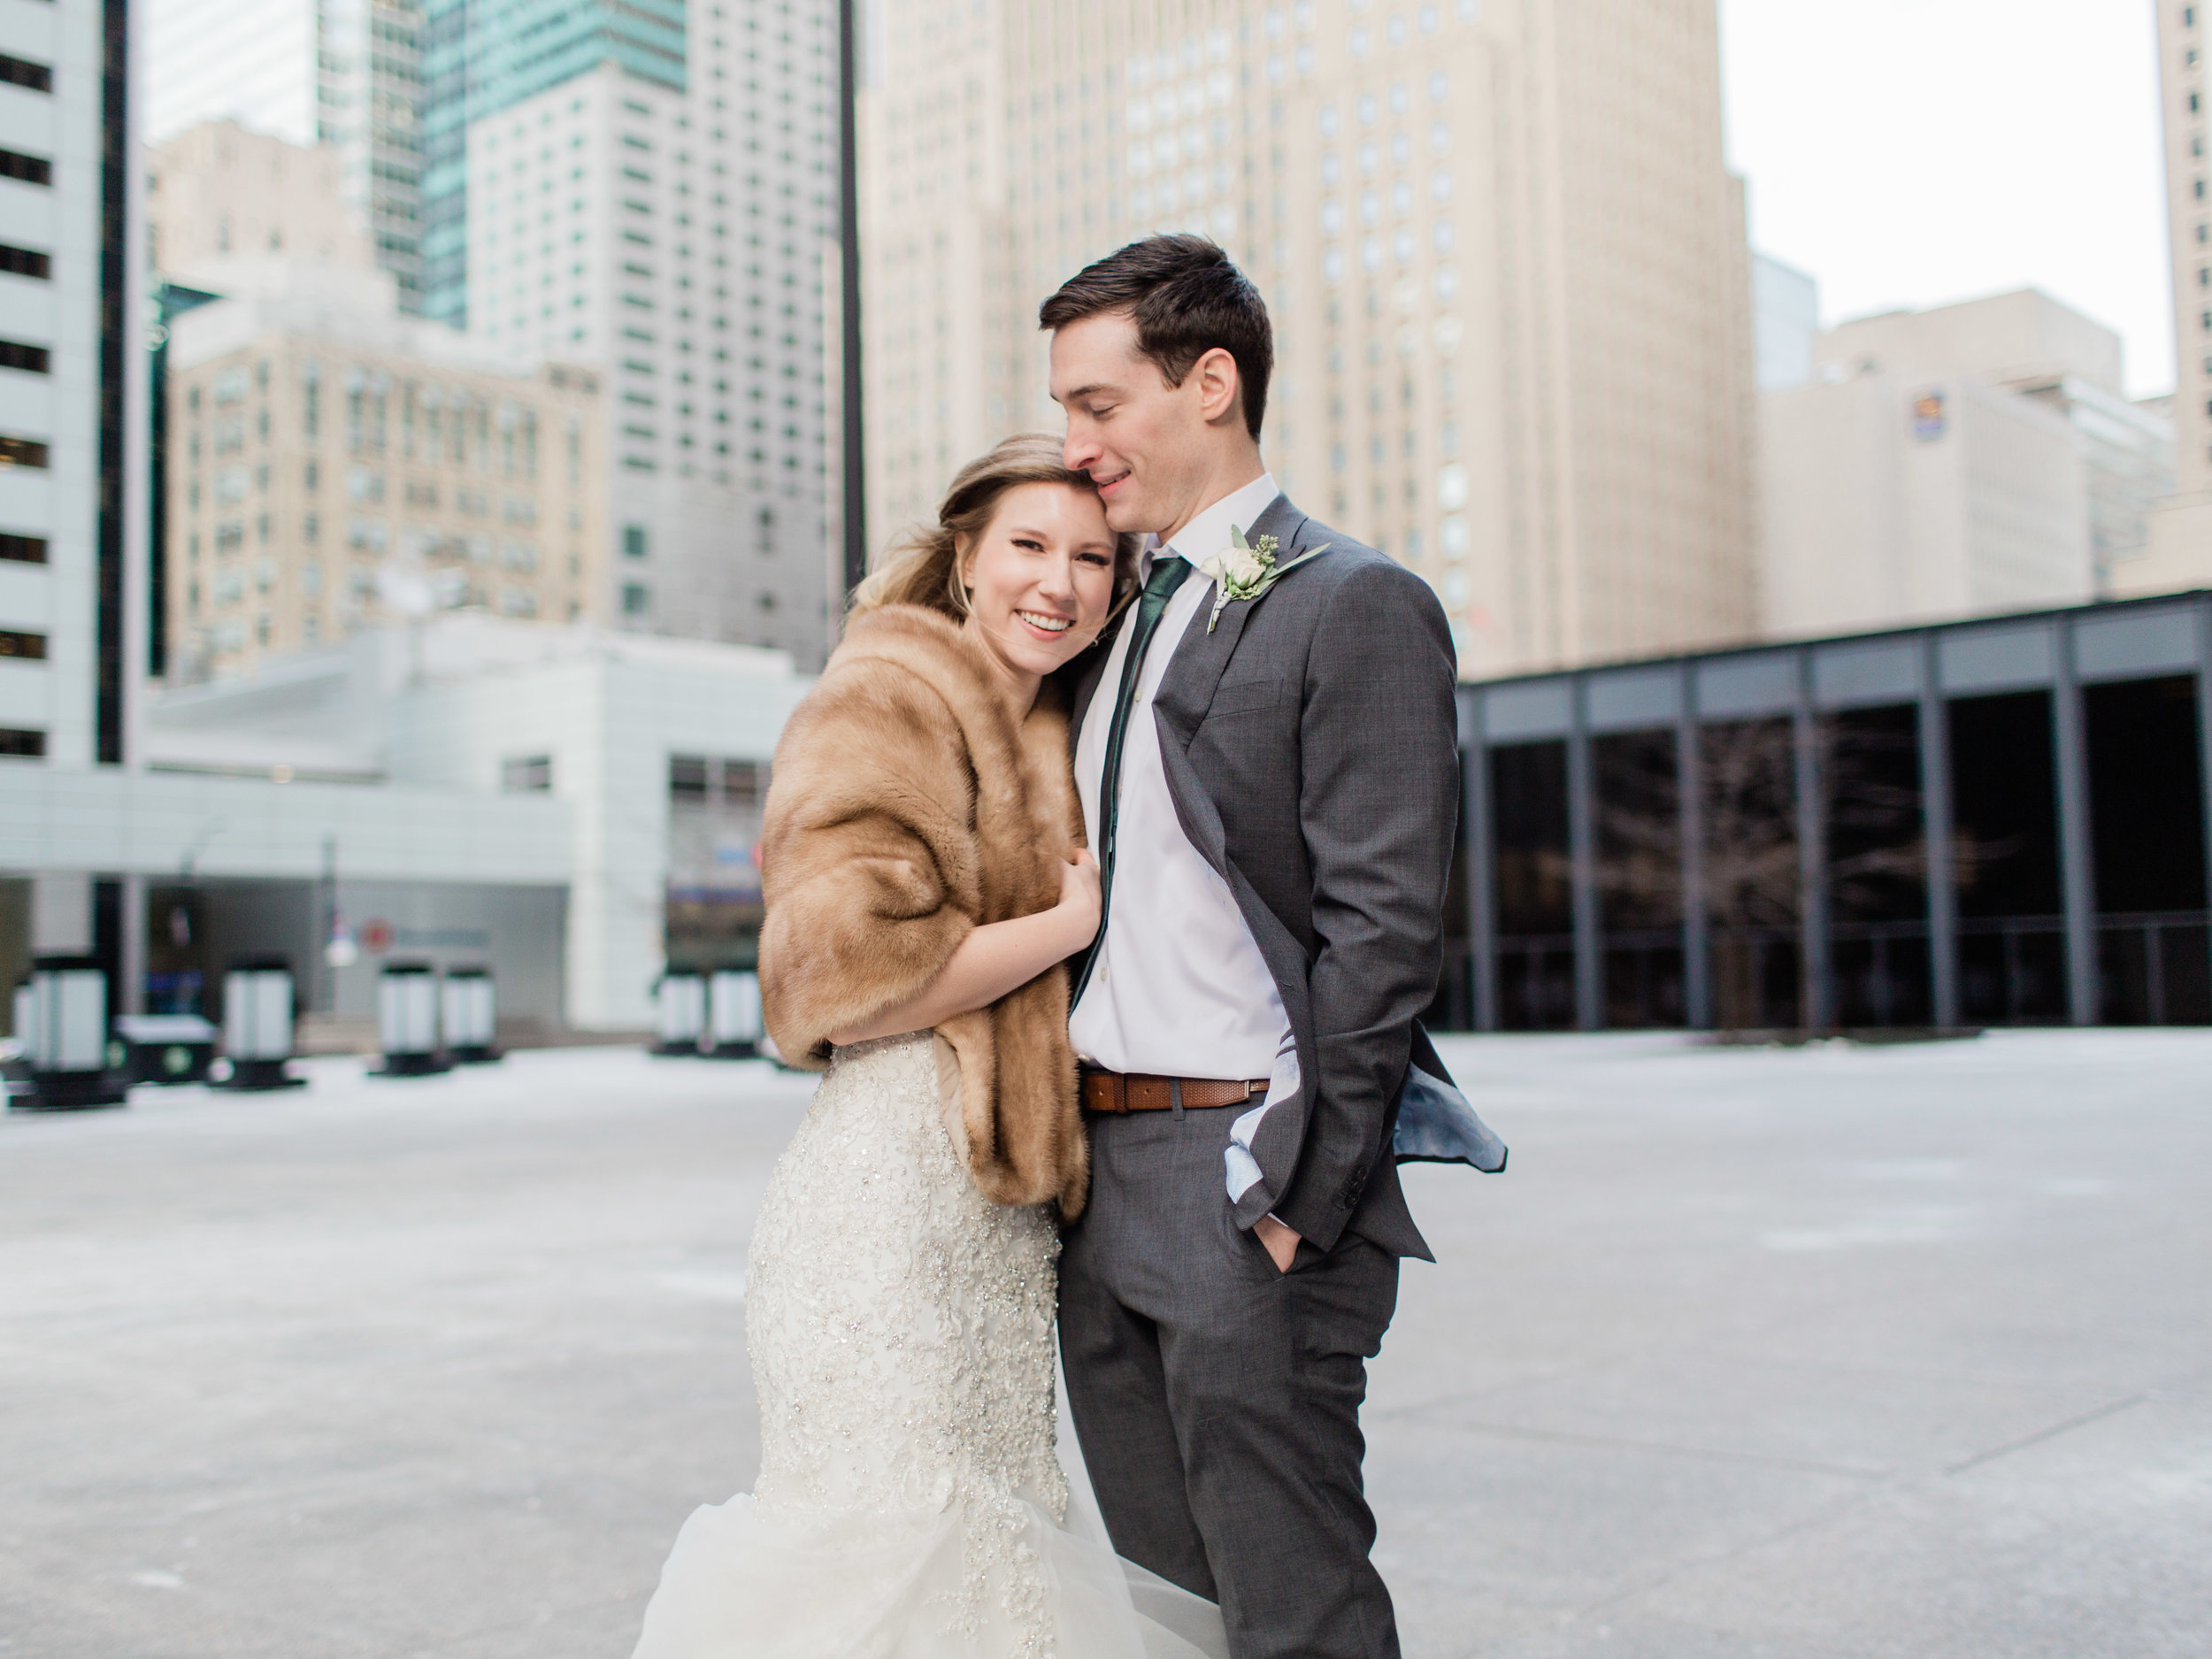 Toronto-wedding-photographer-downtown-winter-wedding-intimate-restaurant-canoe114.jpg